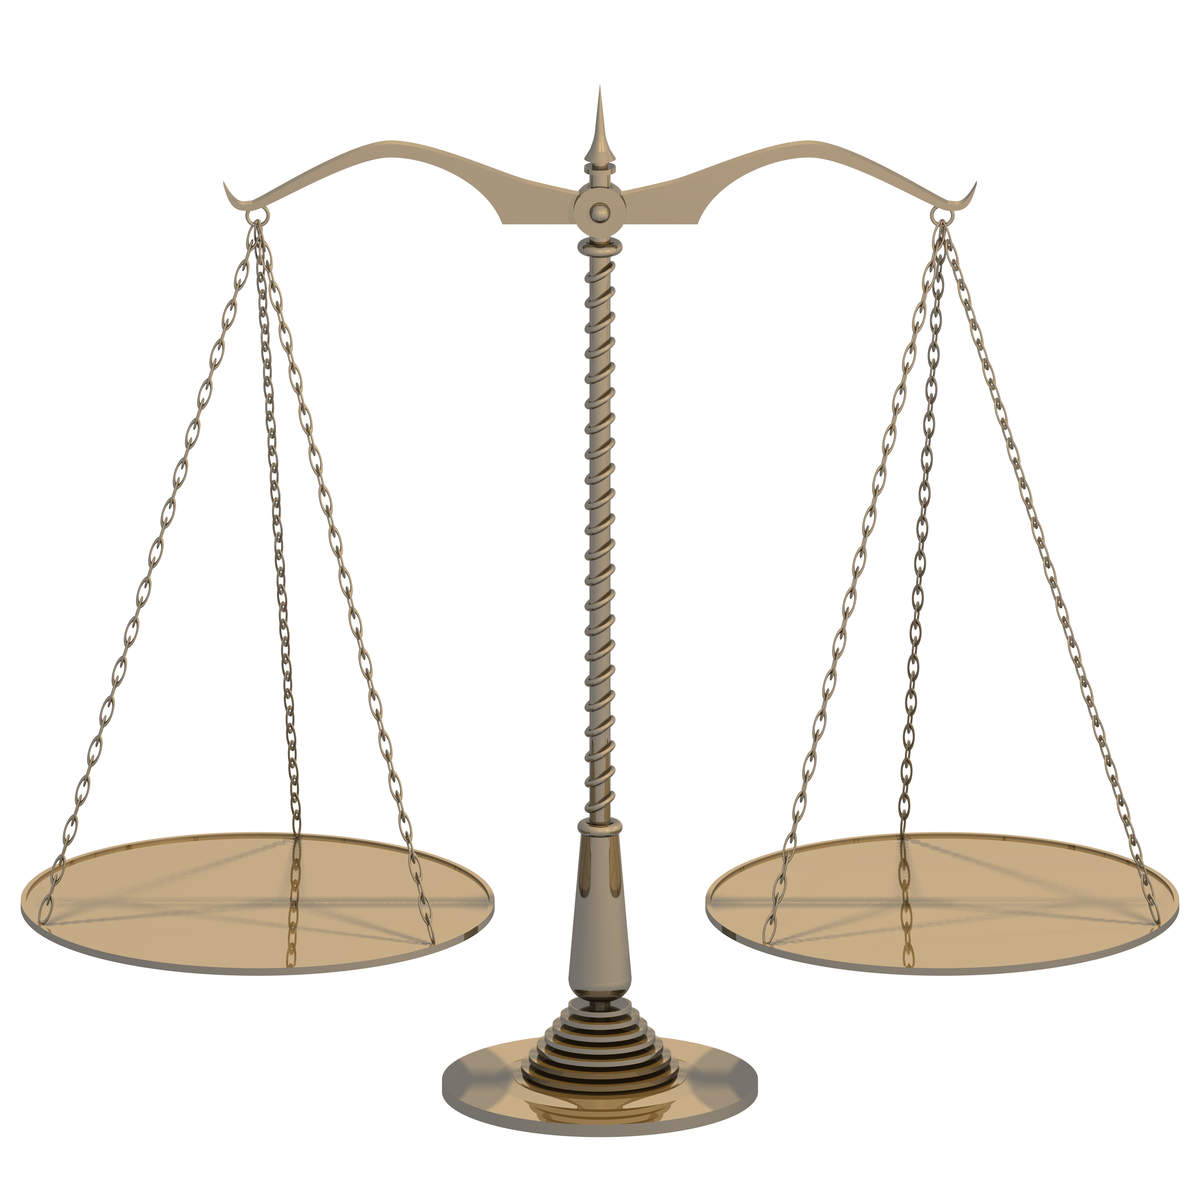 Worksheet. Ley balanza  Wikipedia la enciclopedia libre